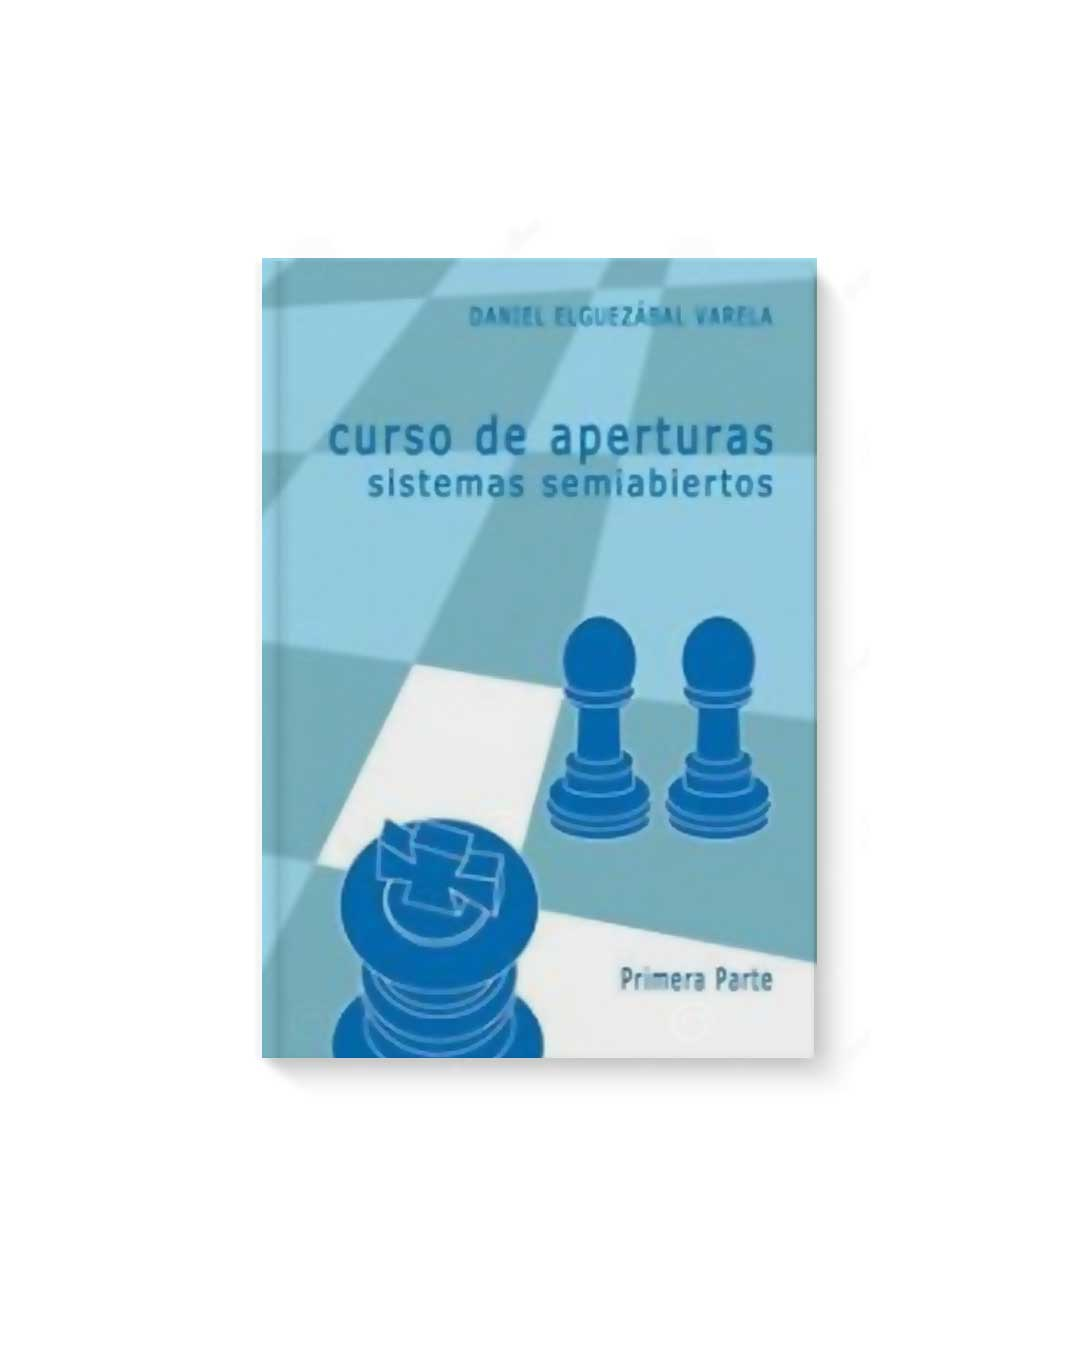 Curso de aperturas sistemas semiabiertos Vol. 1 - Elguezabal